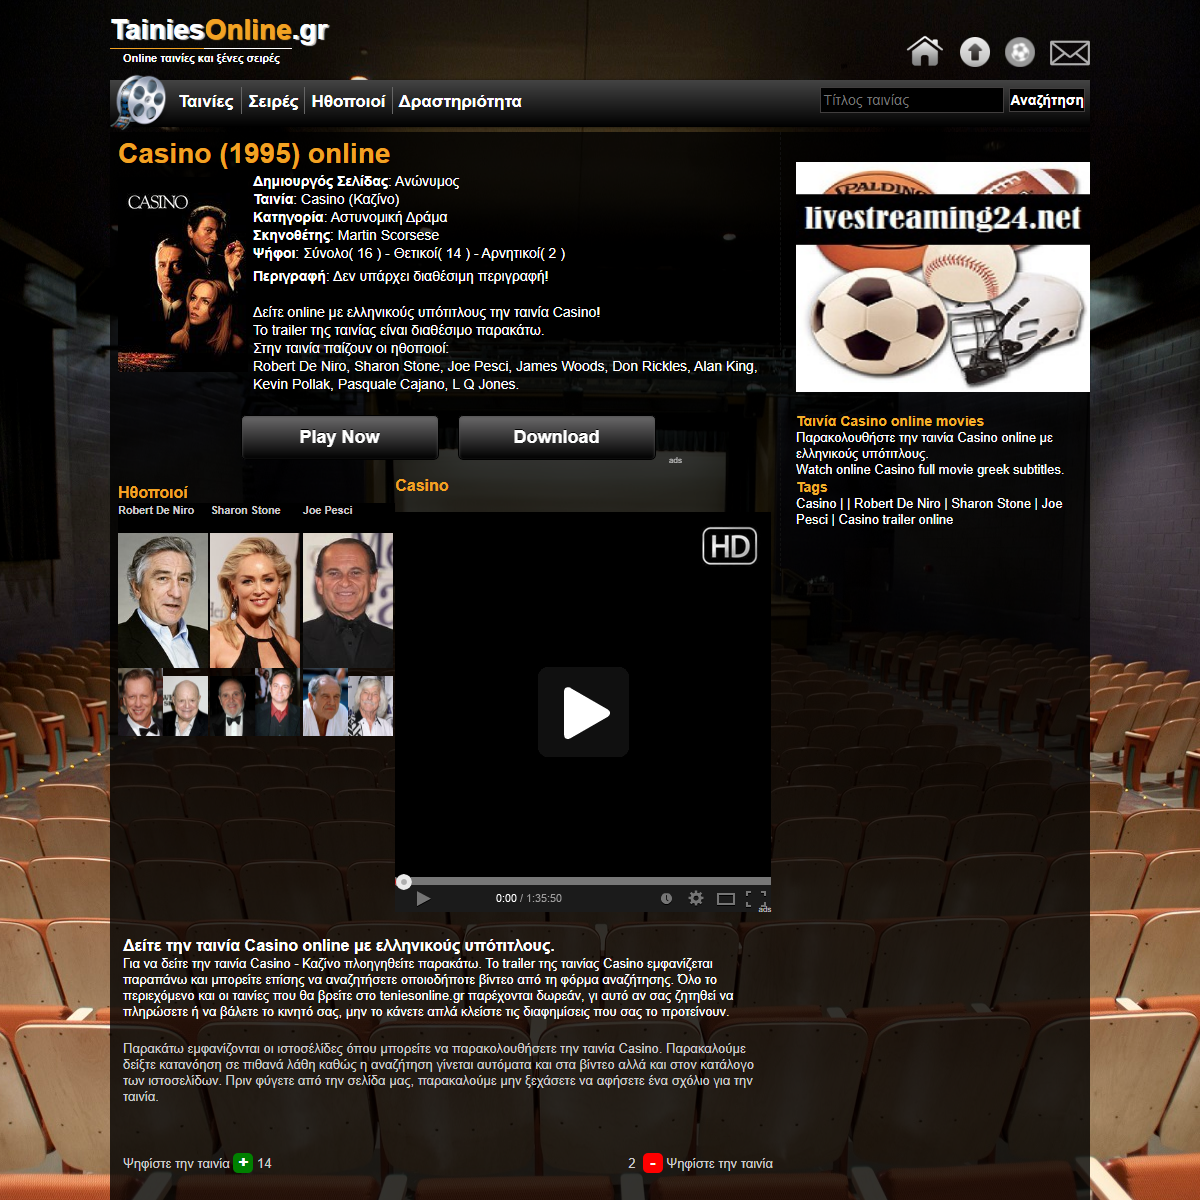 CASINO online movies GREEK SUBS